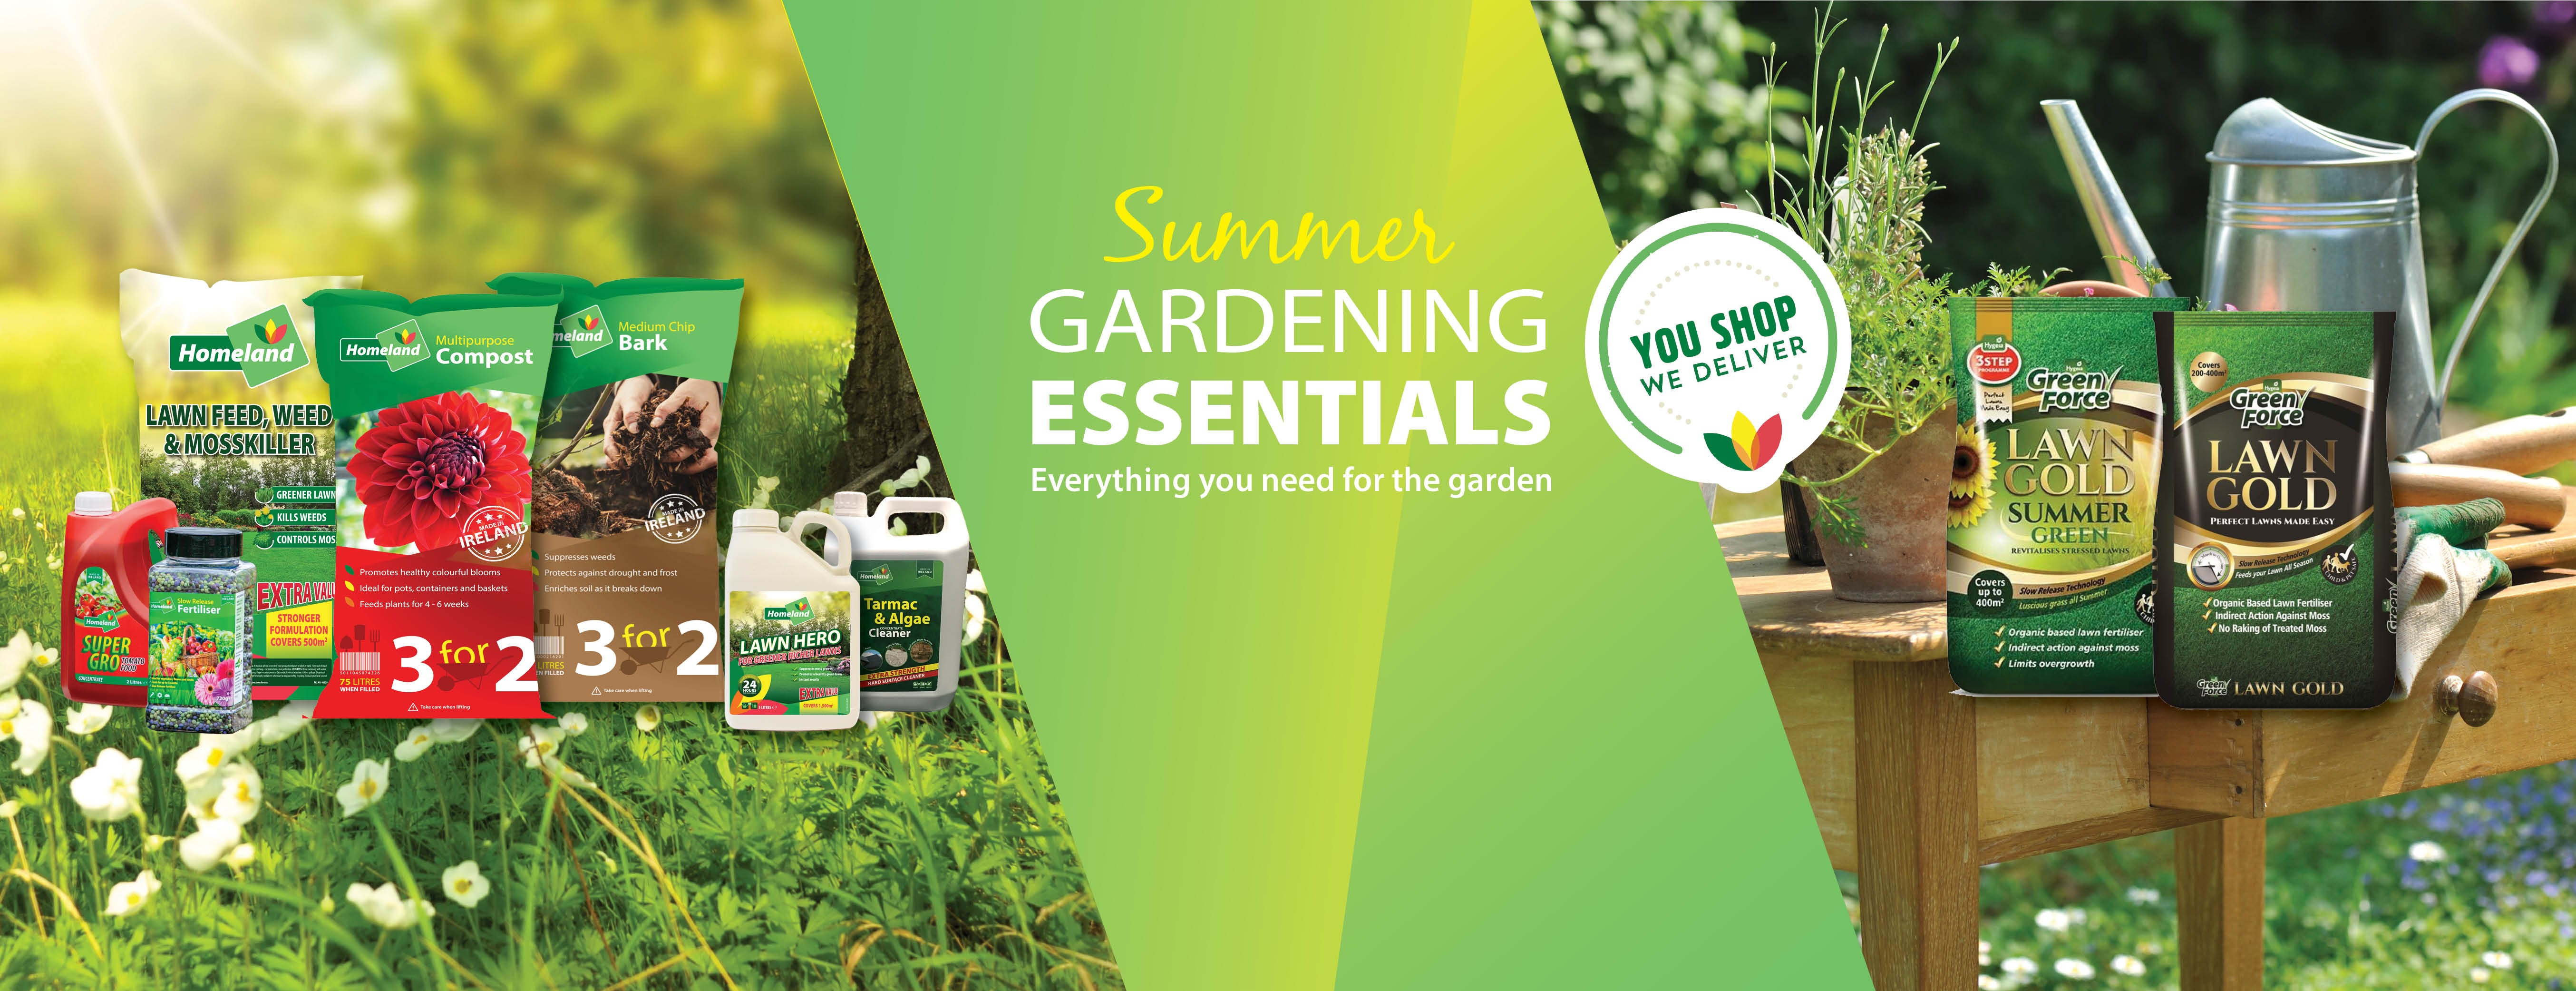 summer-garden-bannerSBRo4fccgjFsc